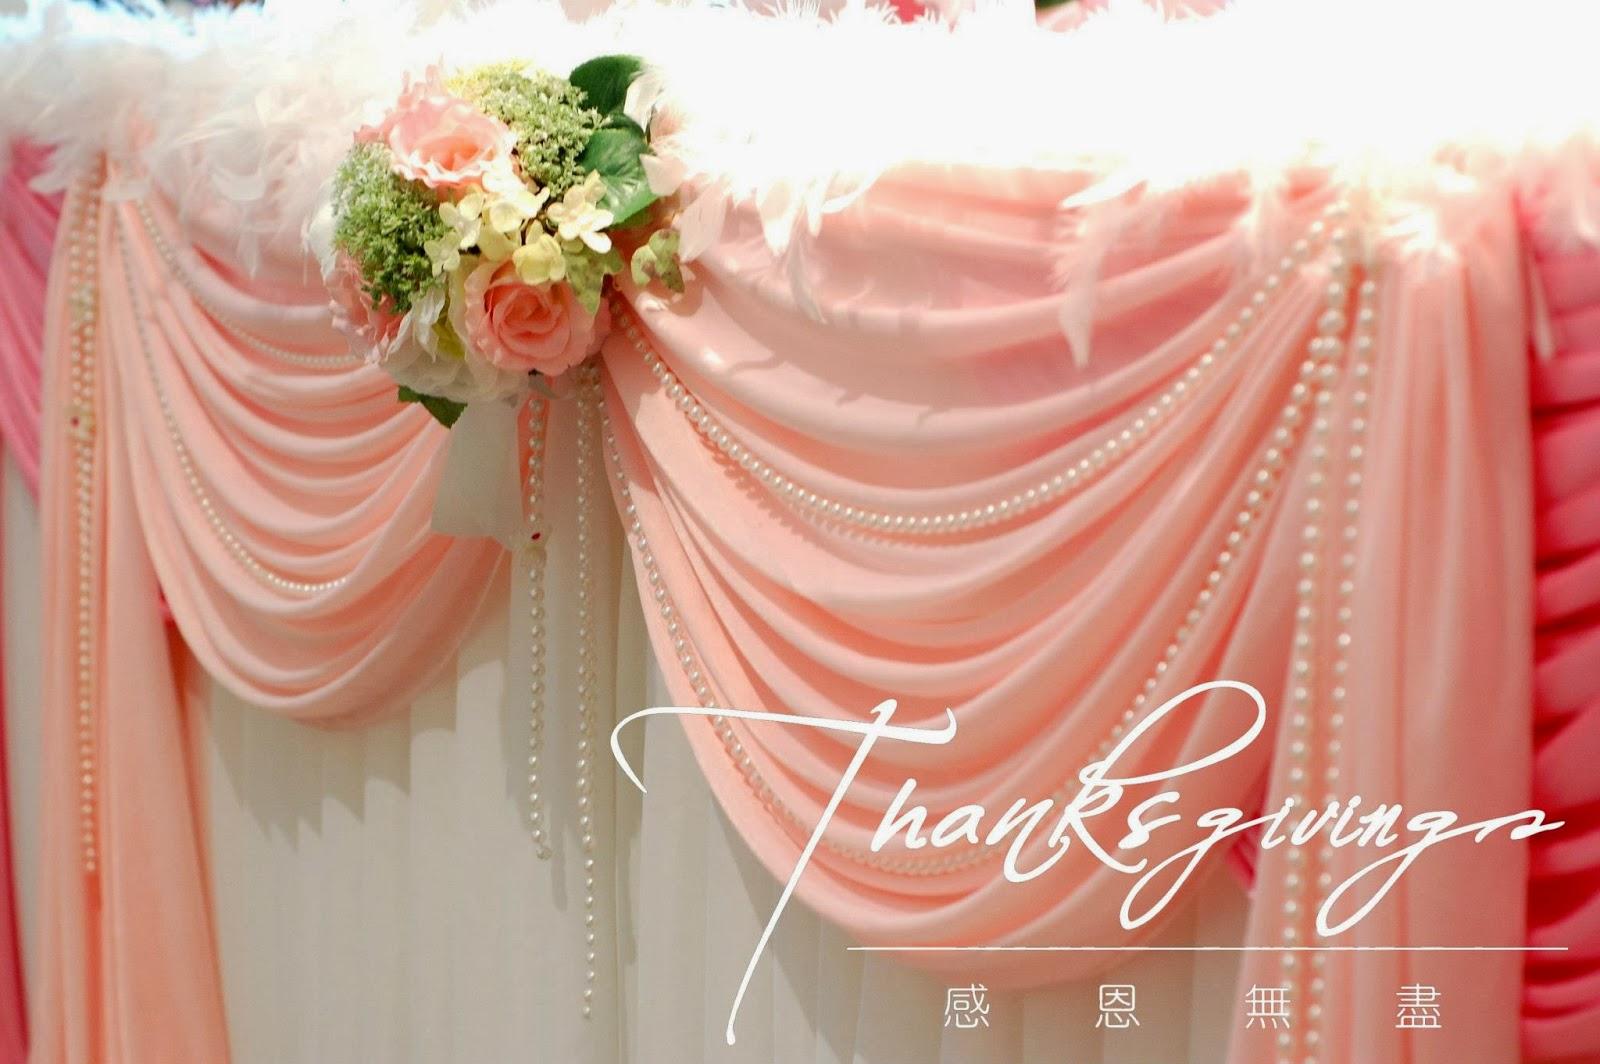 Thanksgivings Wedding : 都會海逸酒店- Salon1 Harbour Plaza Metropolis- Salon1